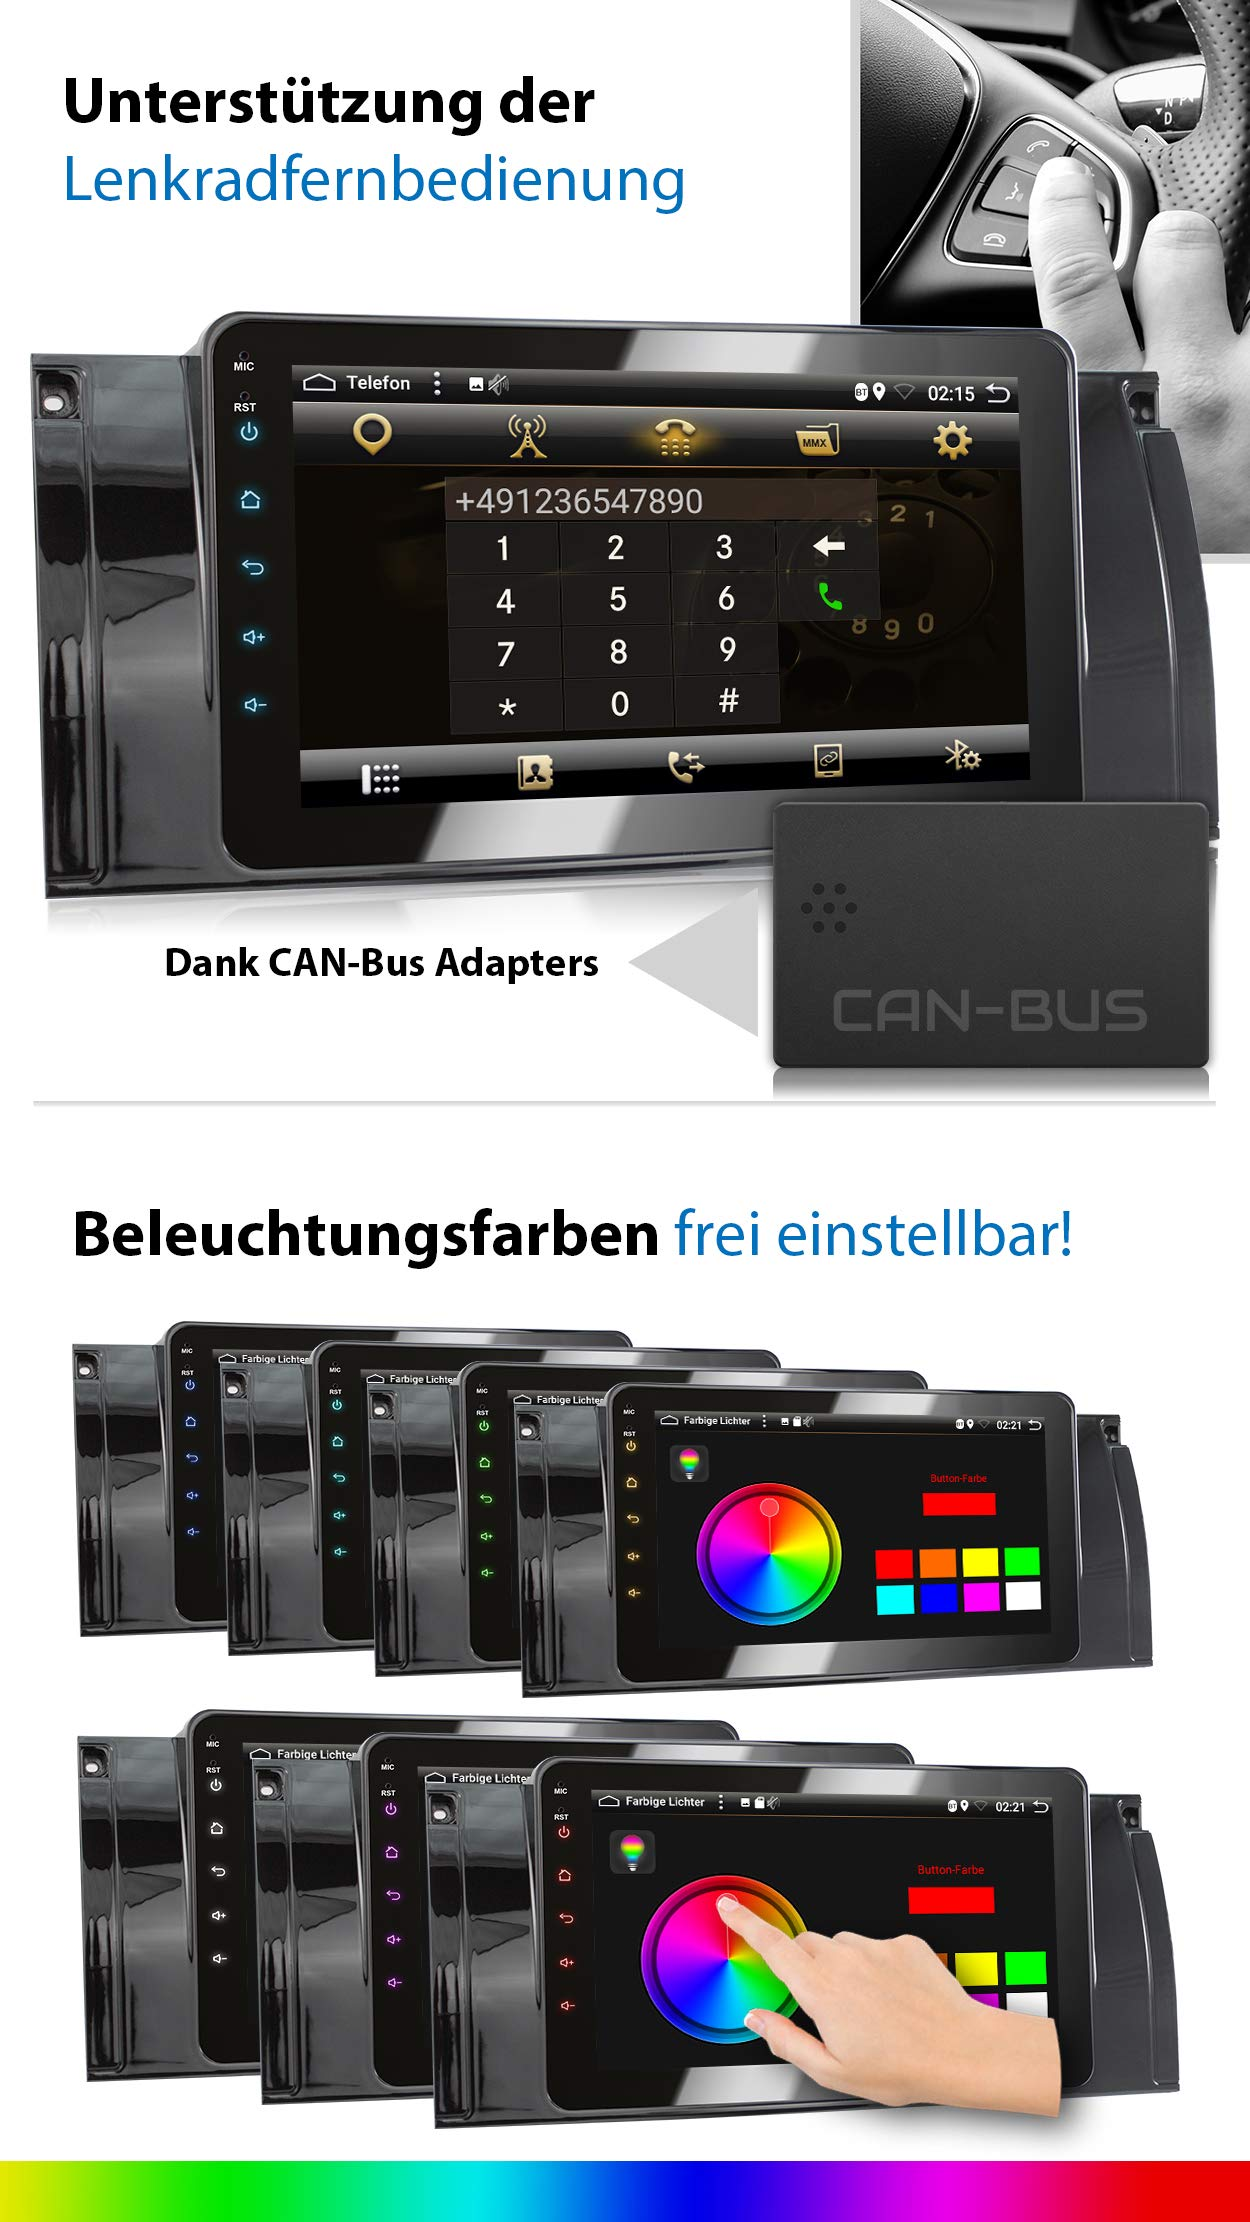 XOMAX-XM-39BA-Autoradio-mit-Android-81-passend-fr-BMW-E39-5er-M5-E53-X5-8Core-2GB-RAM-32GB-ROM-GPS-Navigation-I-Support-WiFi-3G-4G-DAB-OBD2-I-Bluetooth-8-Zoll-203-cm-Touchscreen-USB